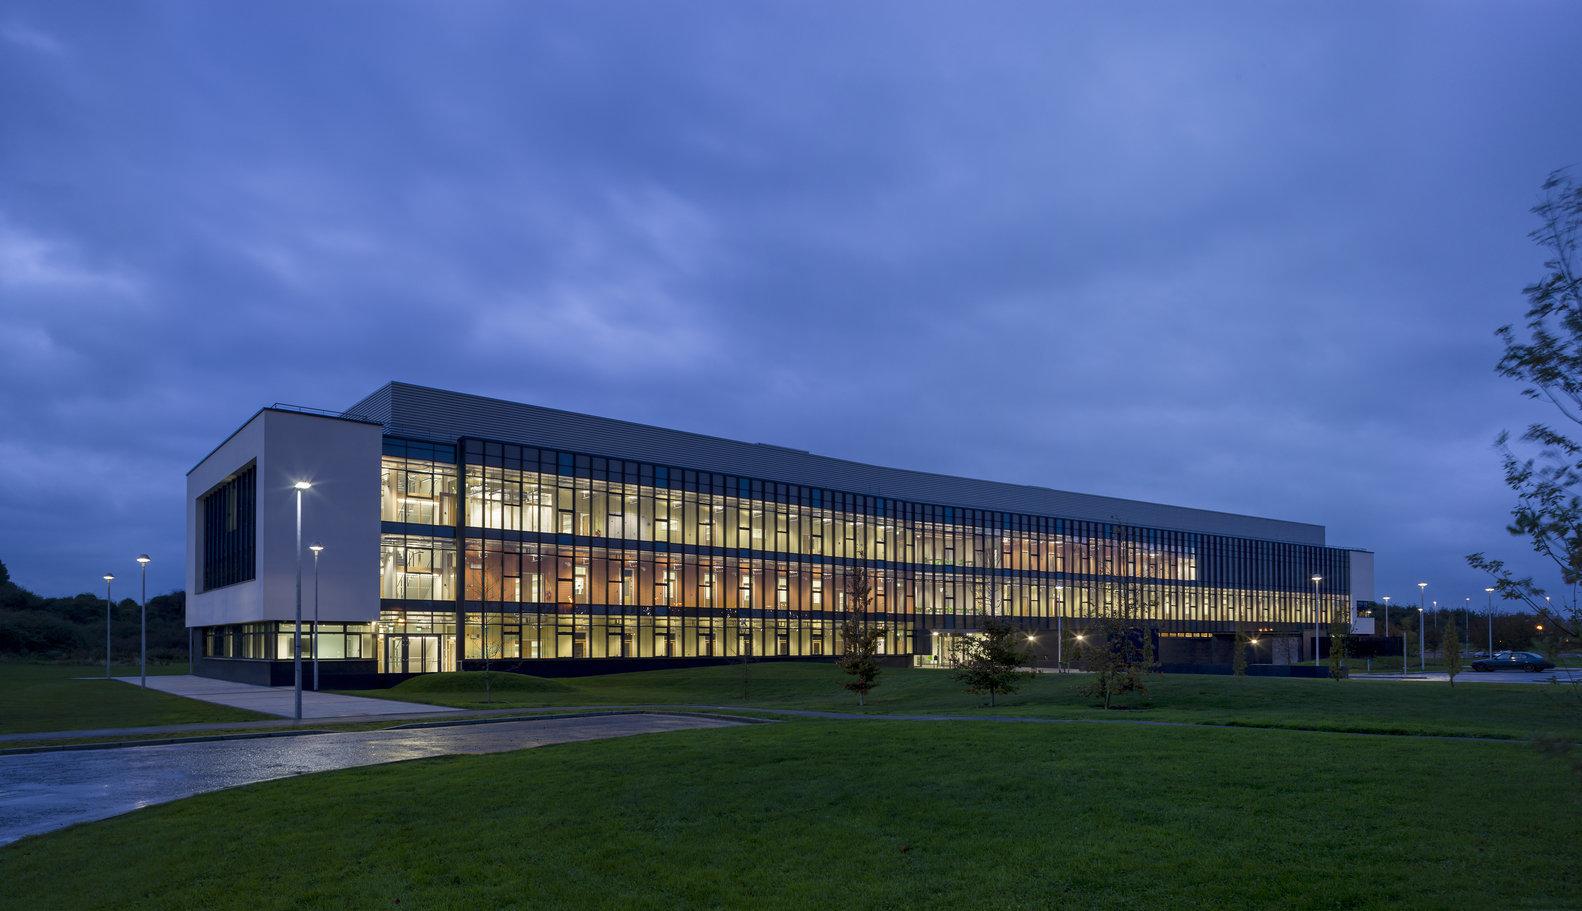 1. Biosciences Research Building (Galway, Ireland)